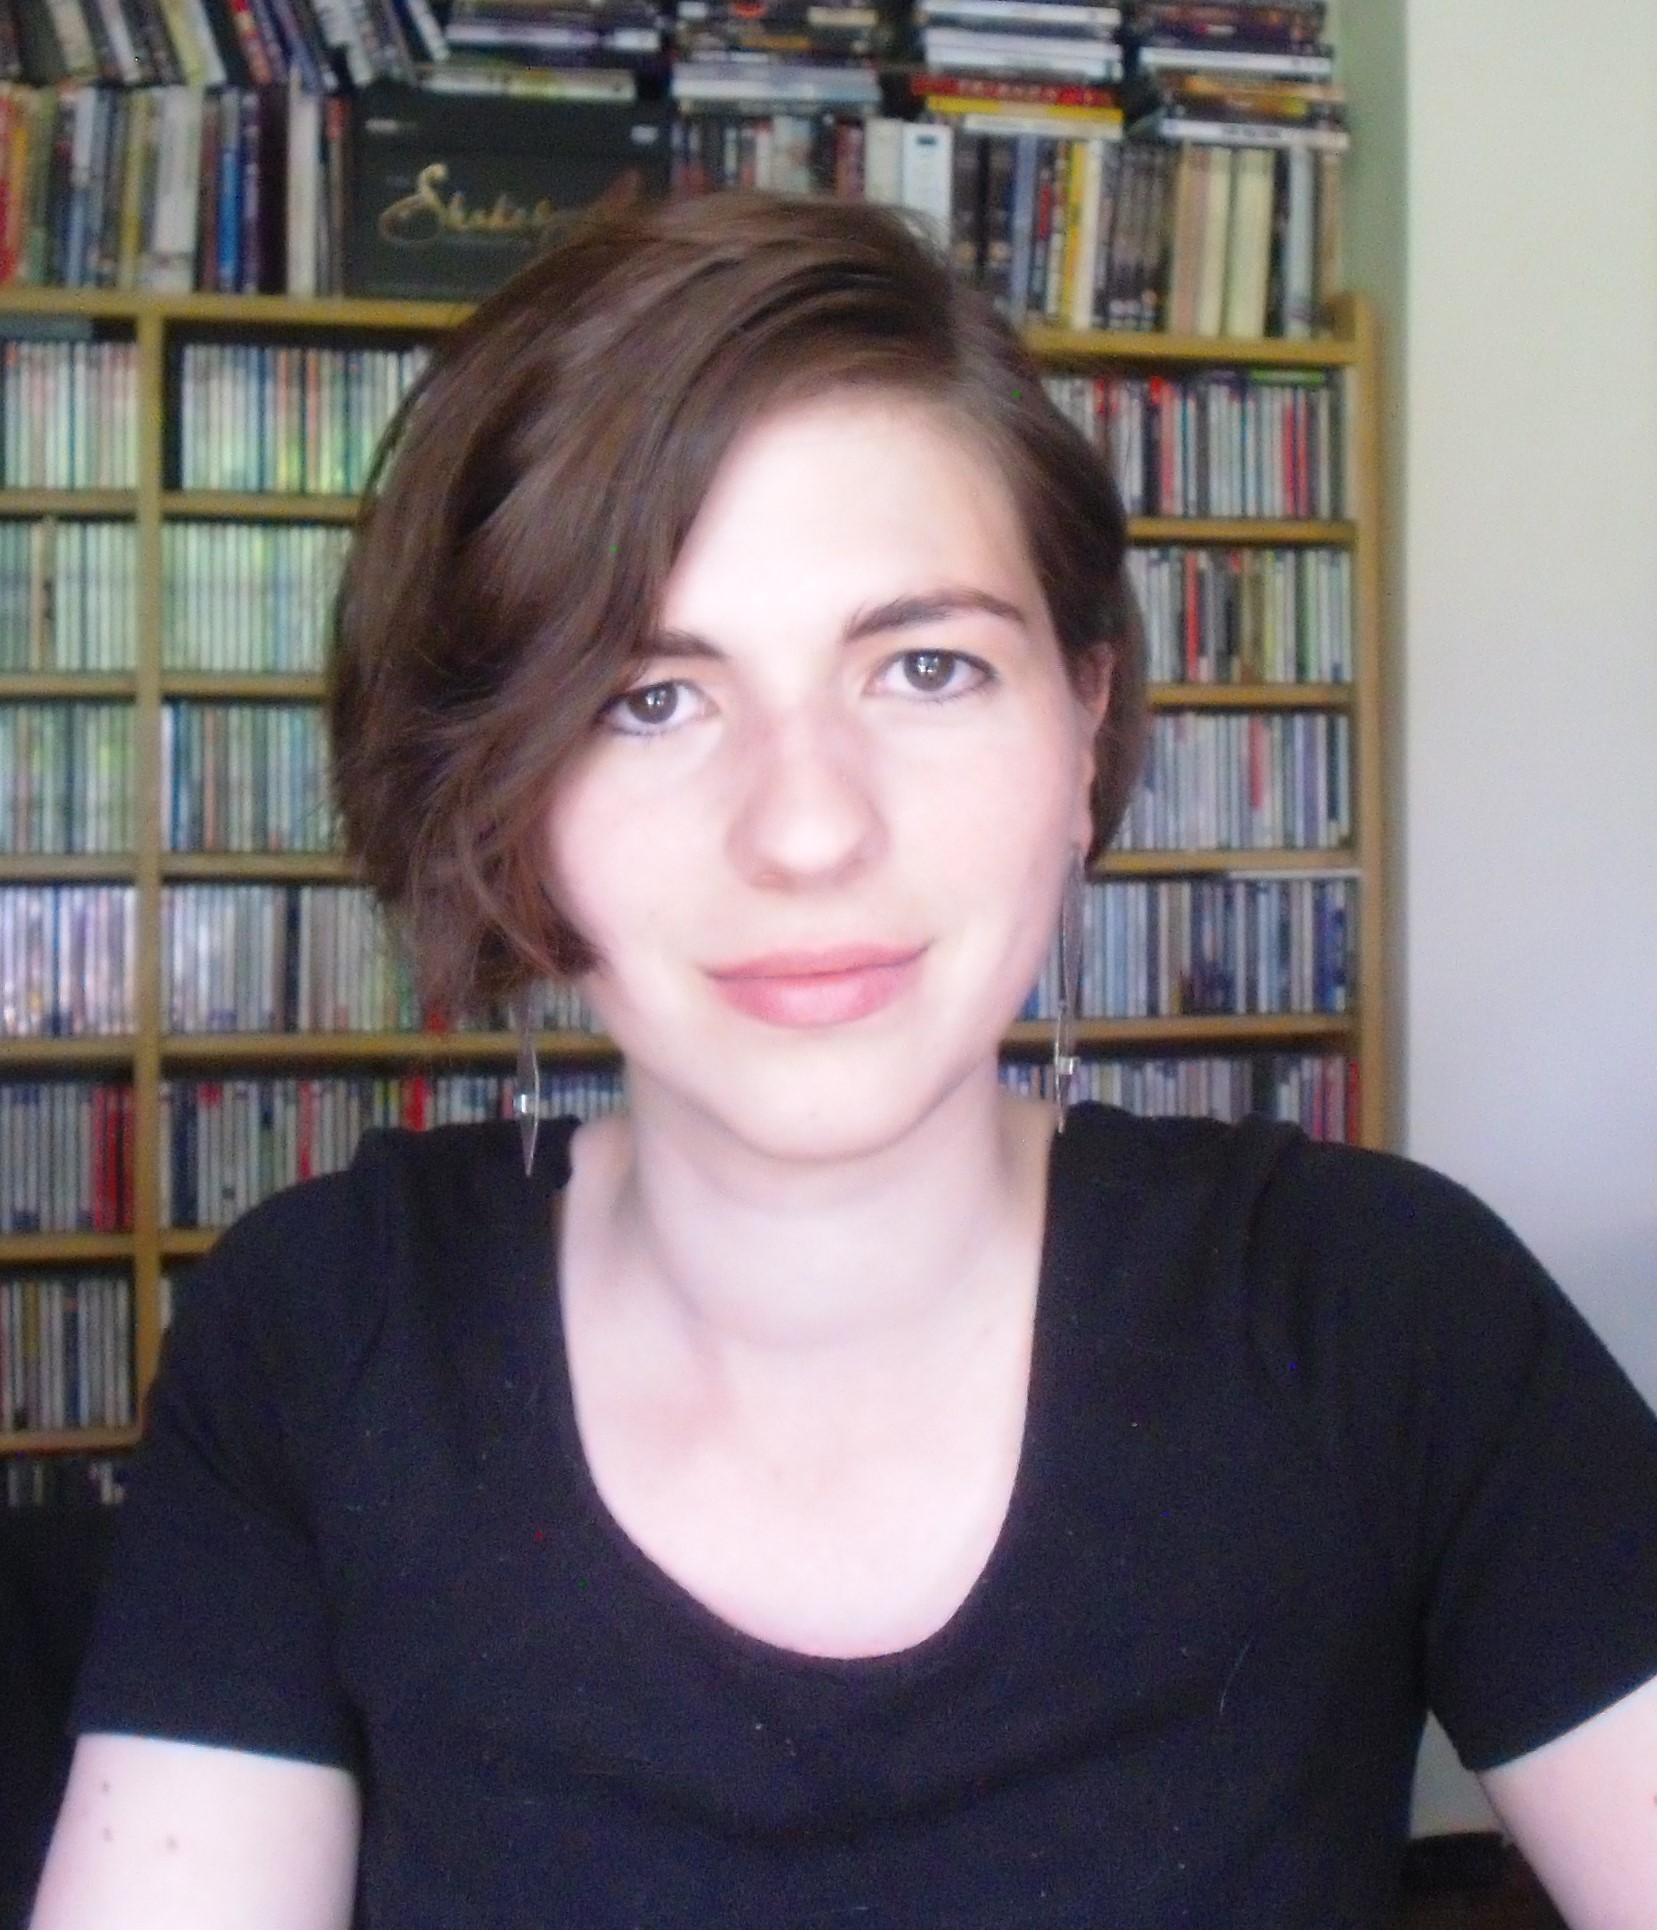 Sophie Reijman